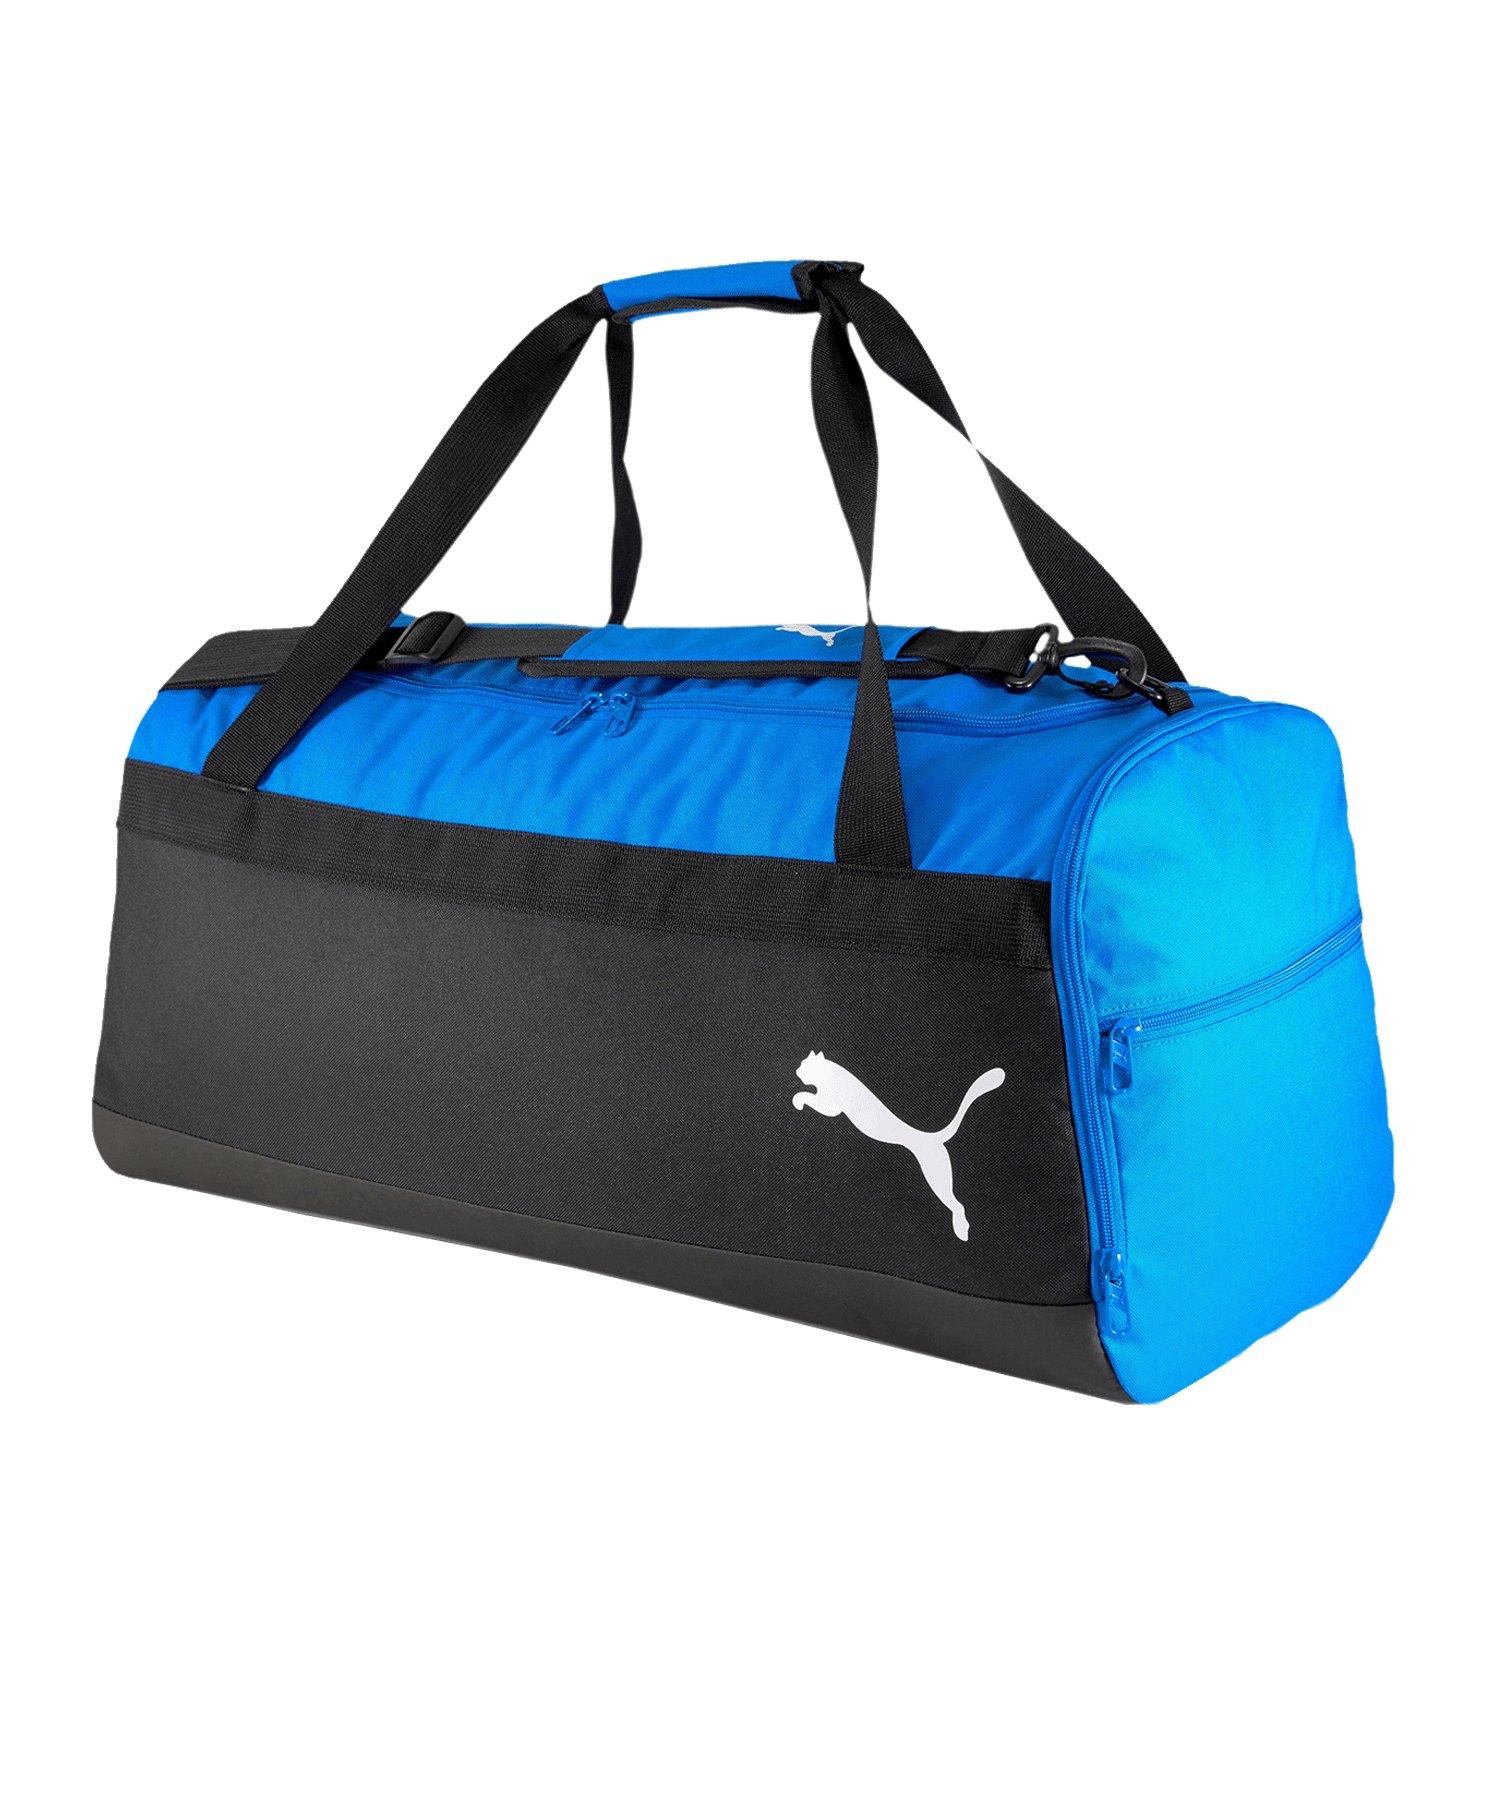 PUMA teamGOAL 23 Teambag Sporttasche Gr. M F02 - blau